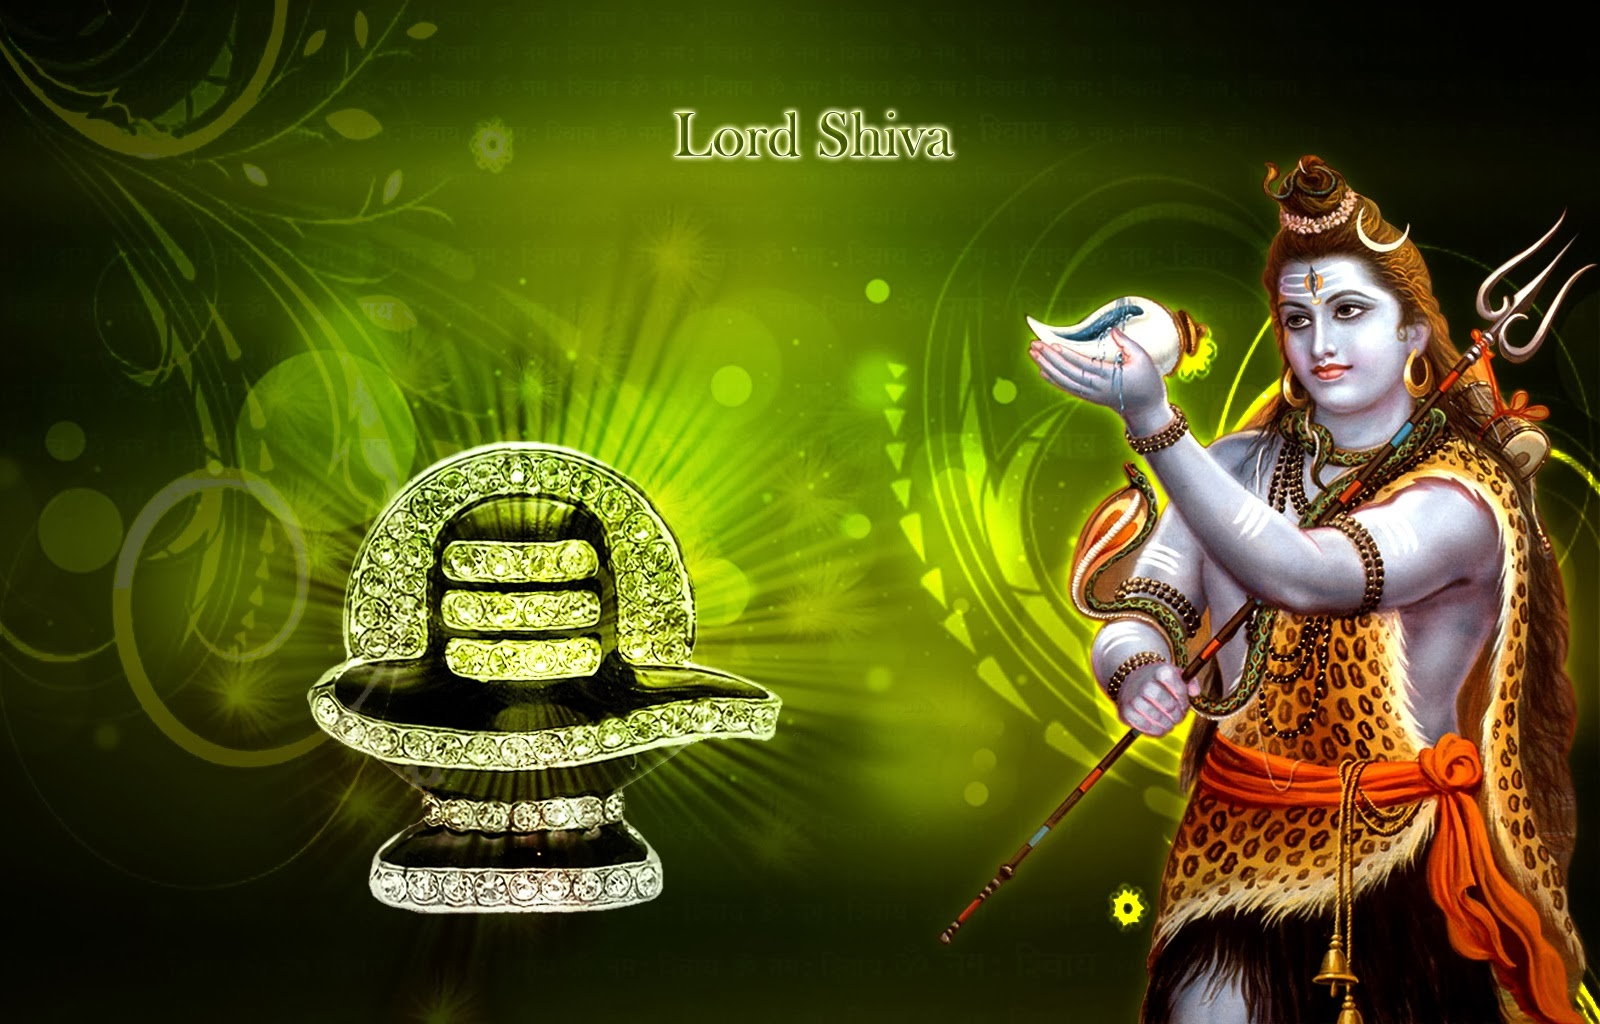 Lord Shiva Wallpapers Hd Free Download For Desktop: Best HD Images Of Shankar, Bholenath, Mahadev, Shiva